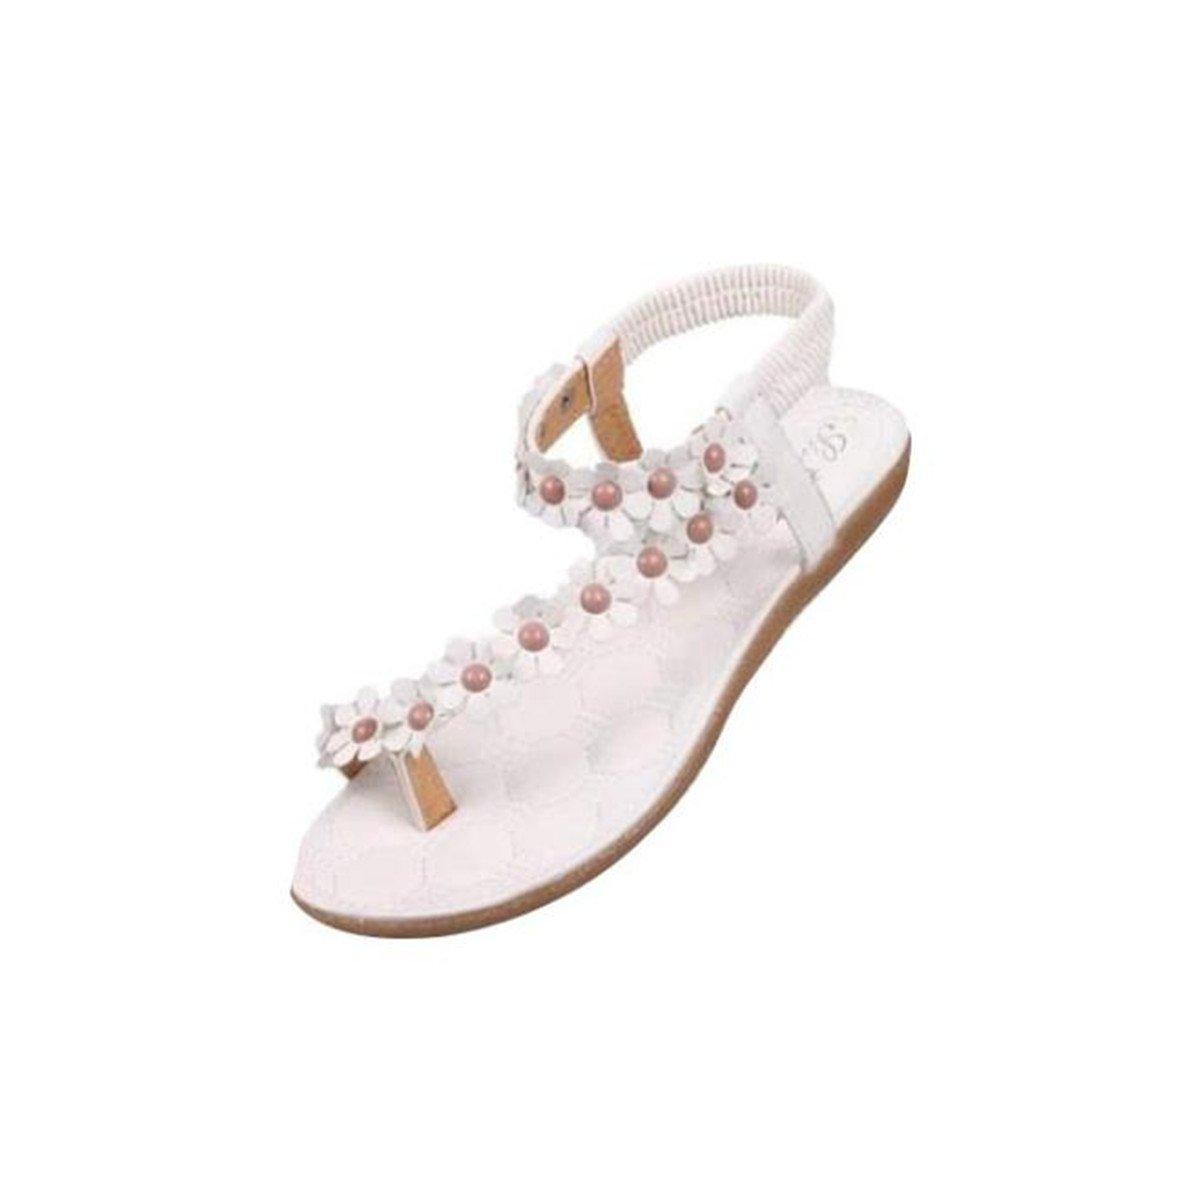 Sandalen Damen Sommer Elegant Bouml;hmen Blumen-Perlen Flip-Flop Schuhe Flache Sandalen Schuhe Mode Strandschuhe Zehentrenner Pantoletten Riemchensandalen  40 EU B